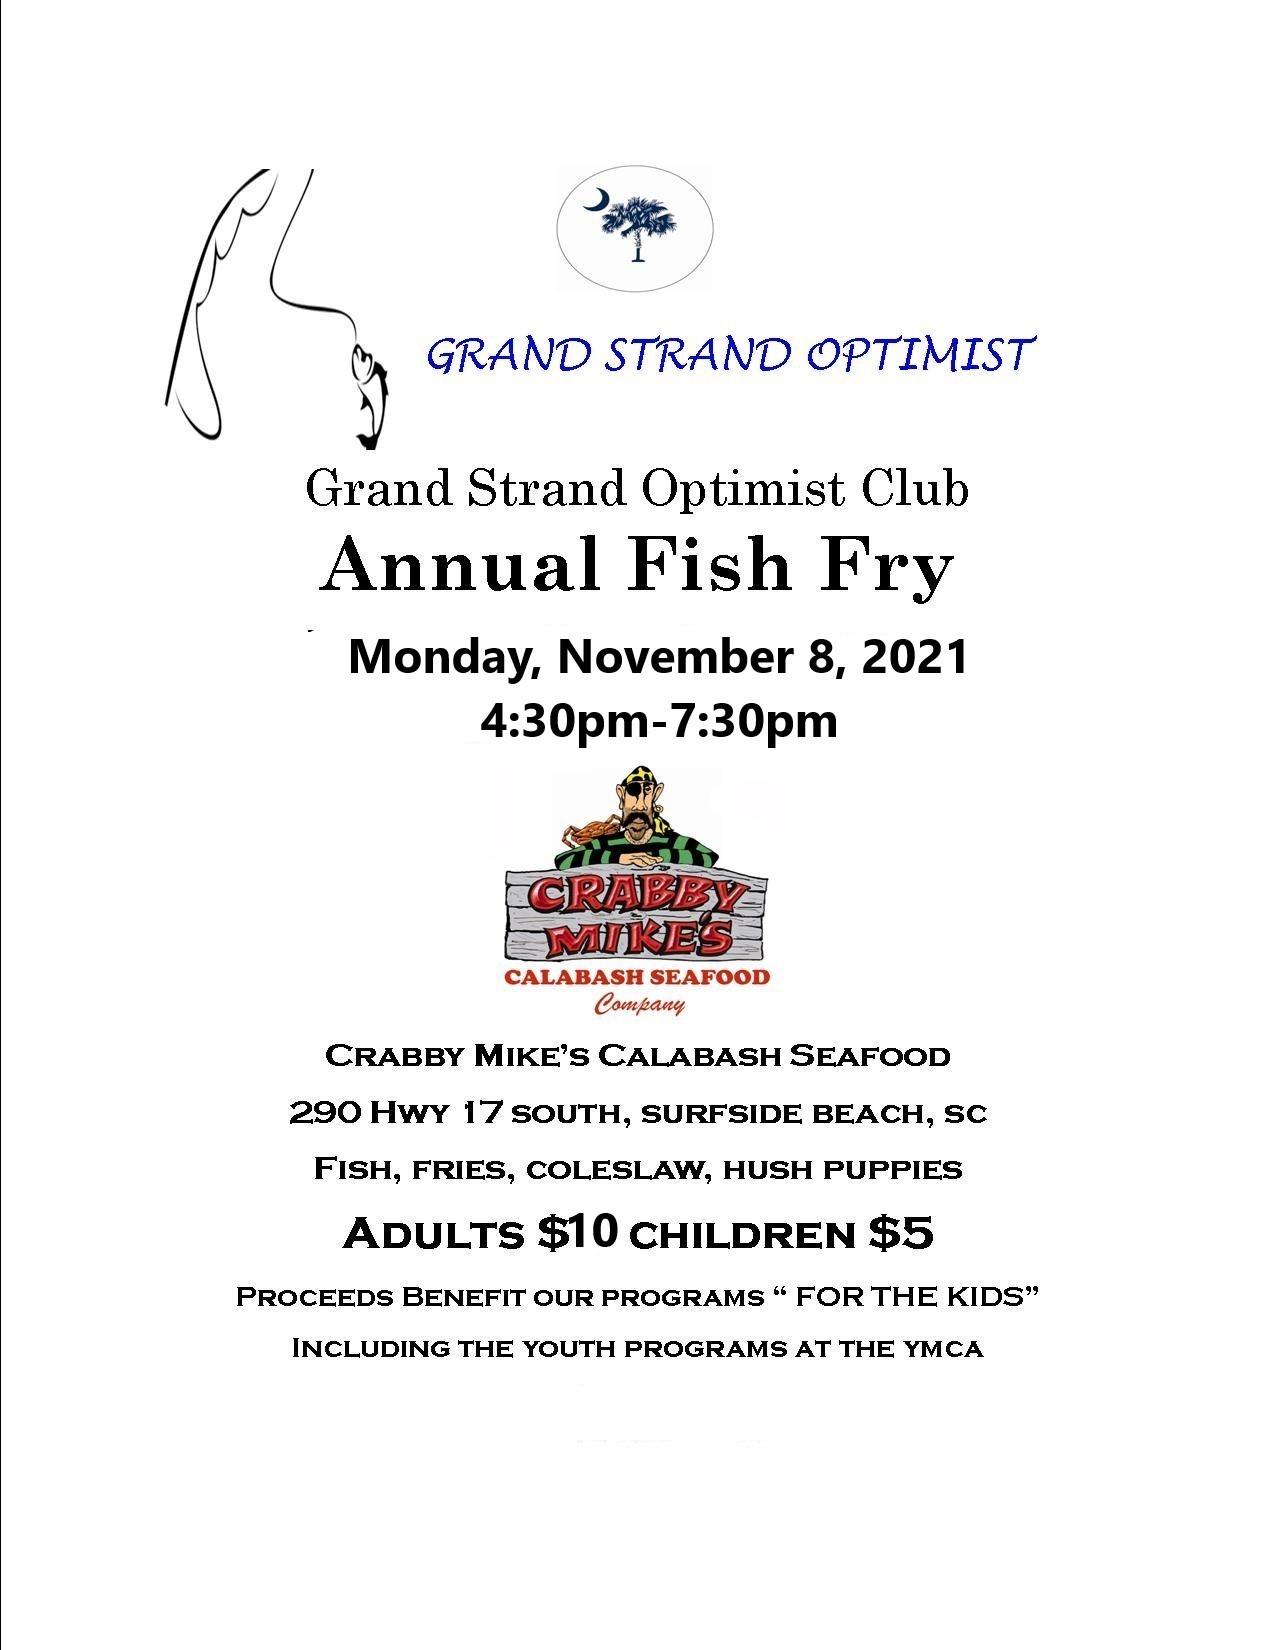 Grand Strand Optimist Annual Fish Fry